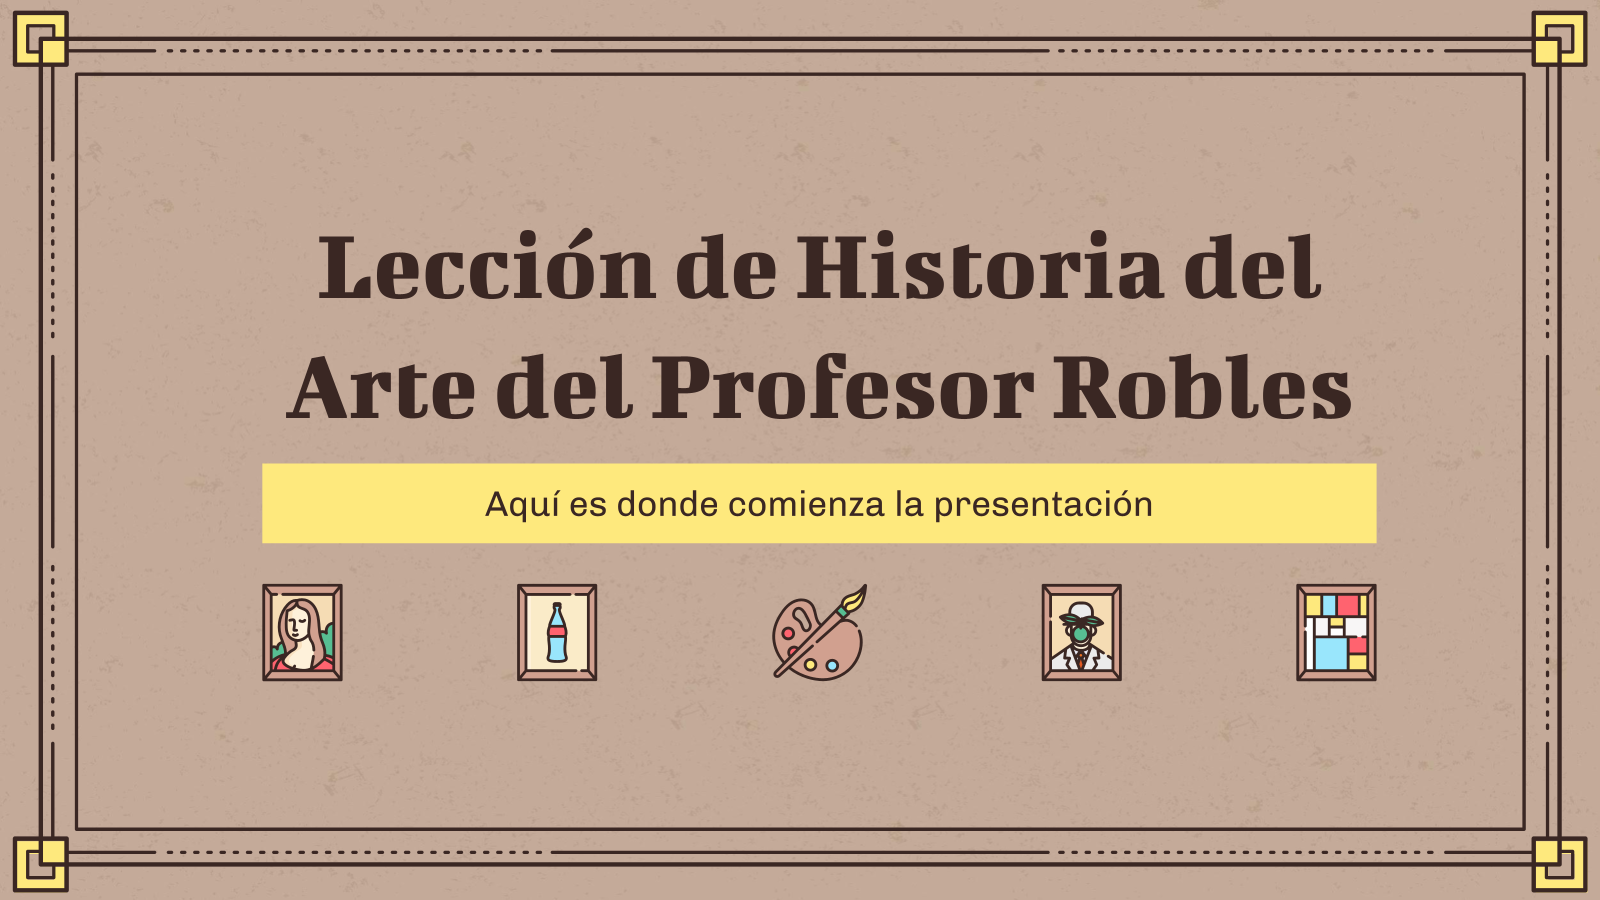 Lección Historia de Arte del Profesor Robles : Modèles de présentation